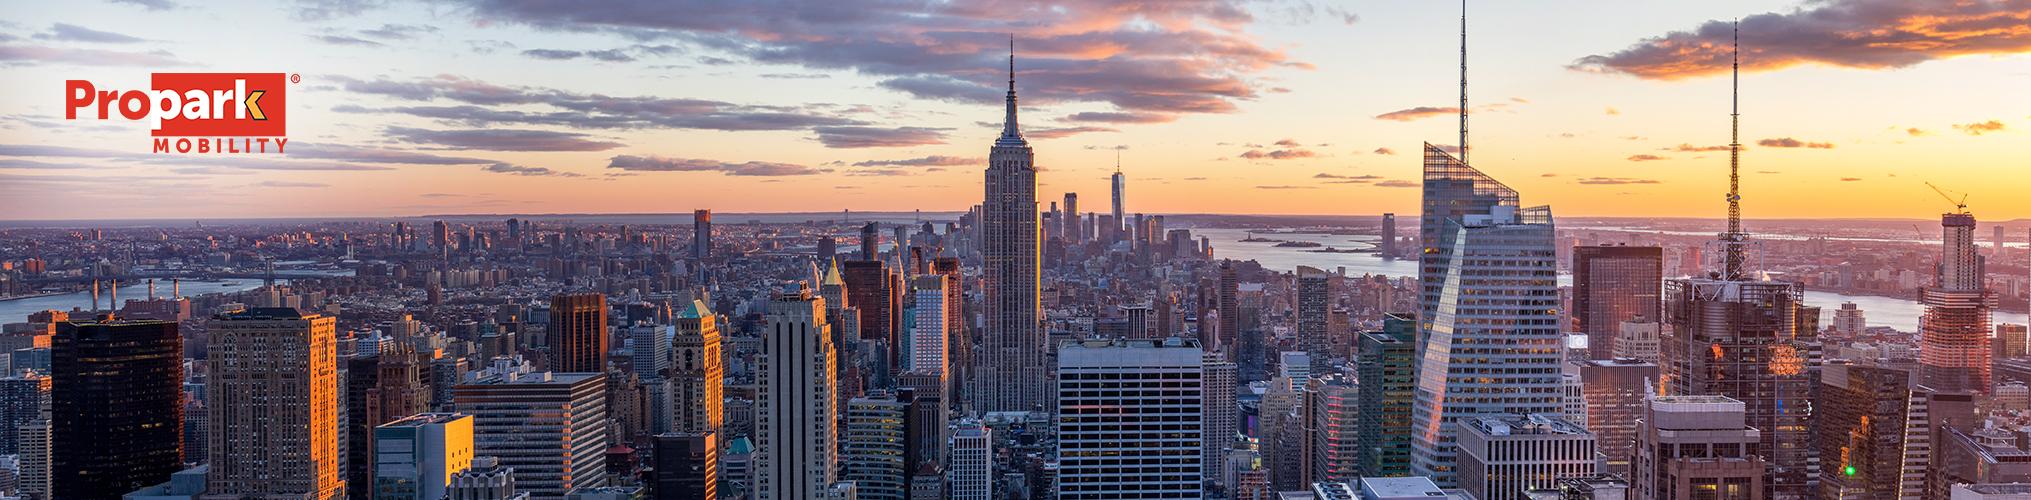 New York City Skyline Propark